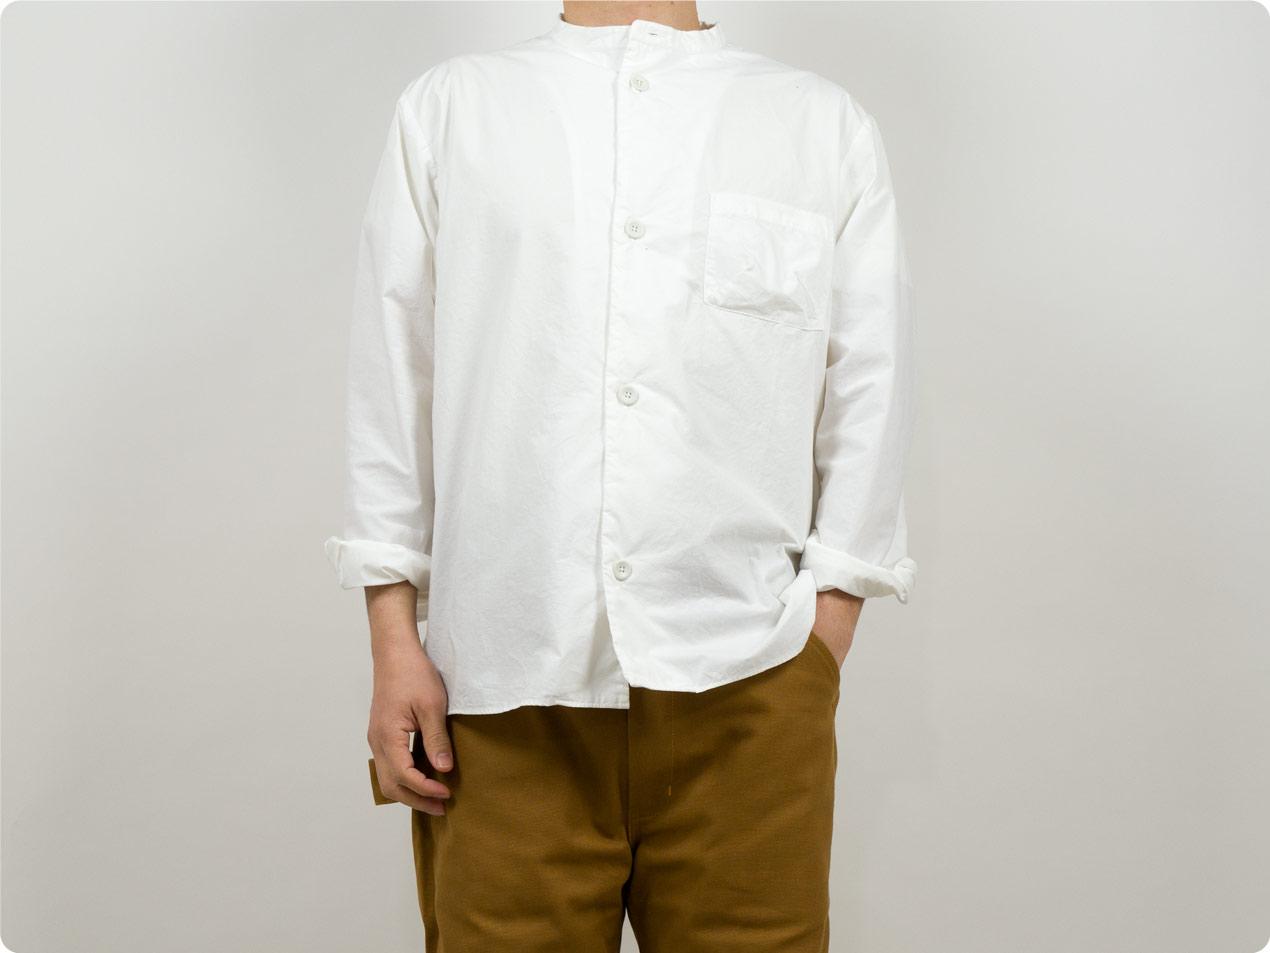 LOLO 40タイプライター スタンドカラーシャツ